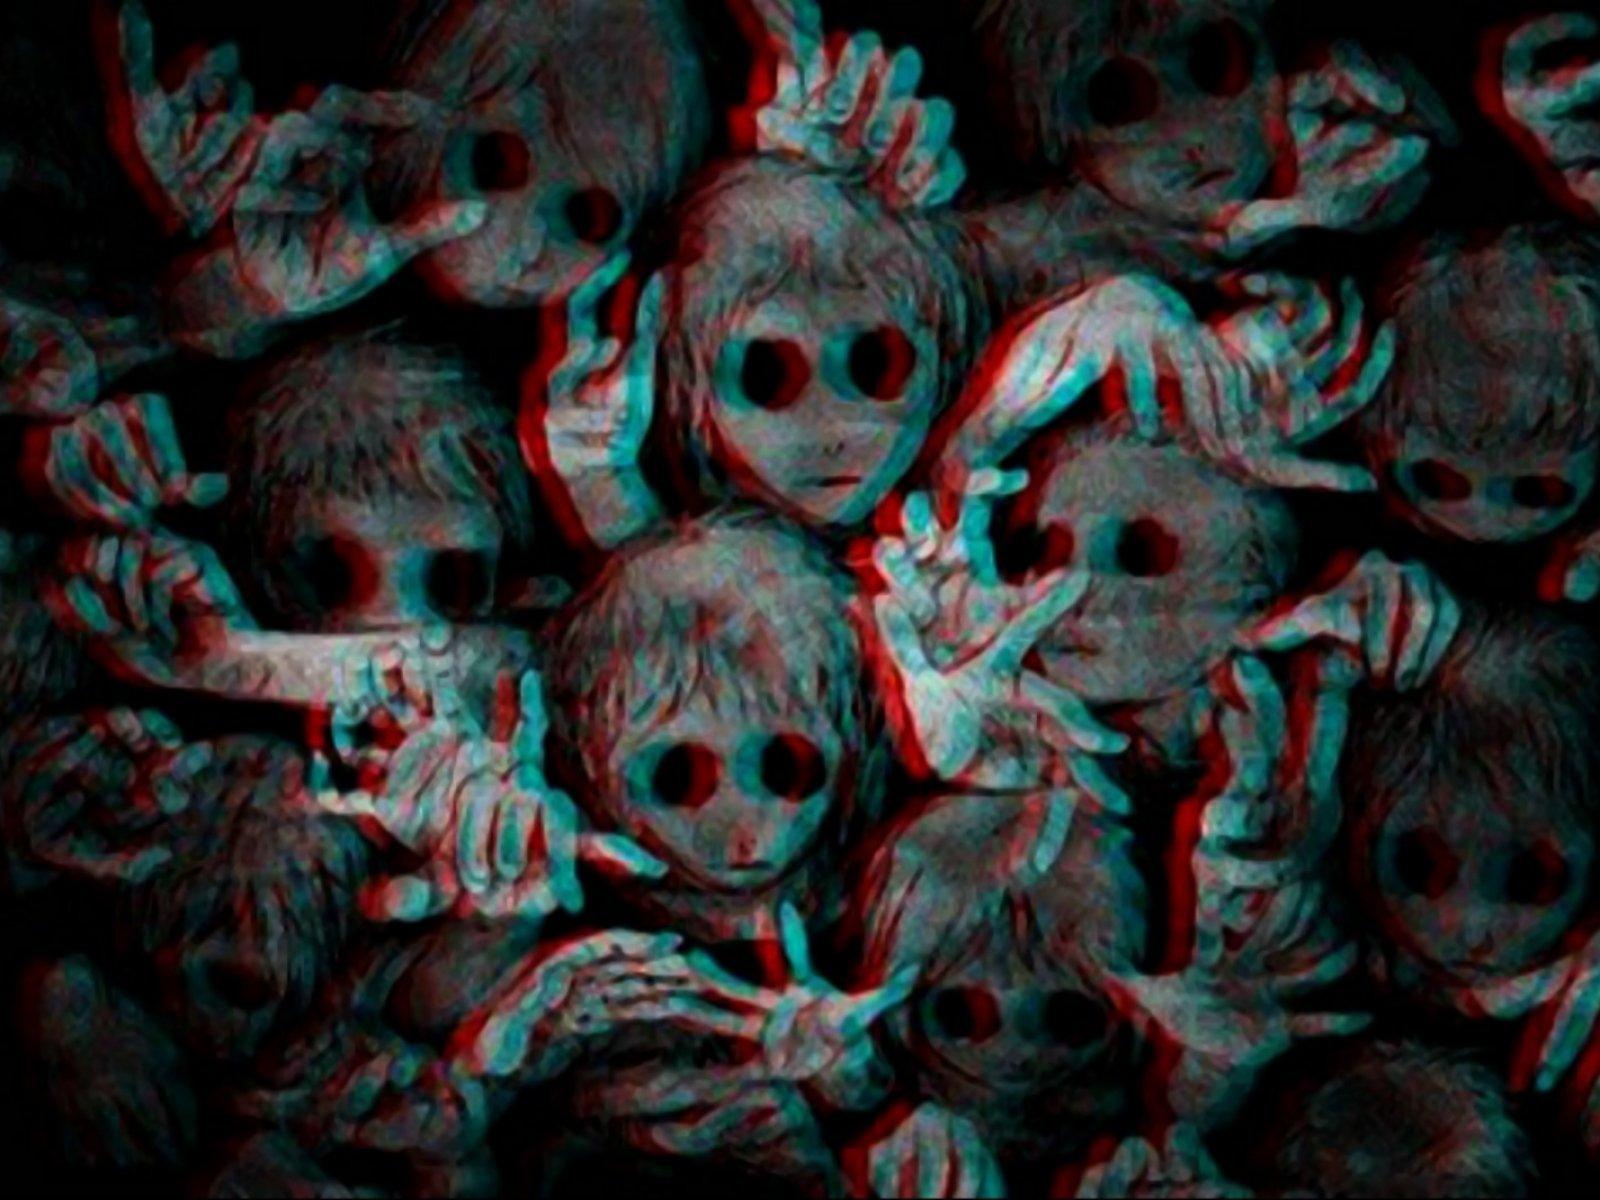 Dark creepy scary horror evil art artwork wallpaper ... Hd Wallpaper 1920x1080 Download